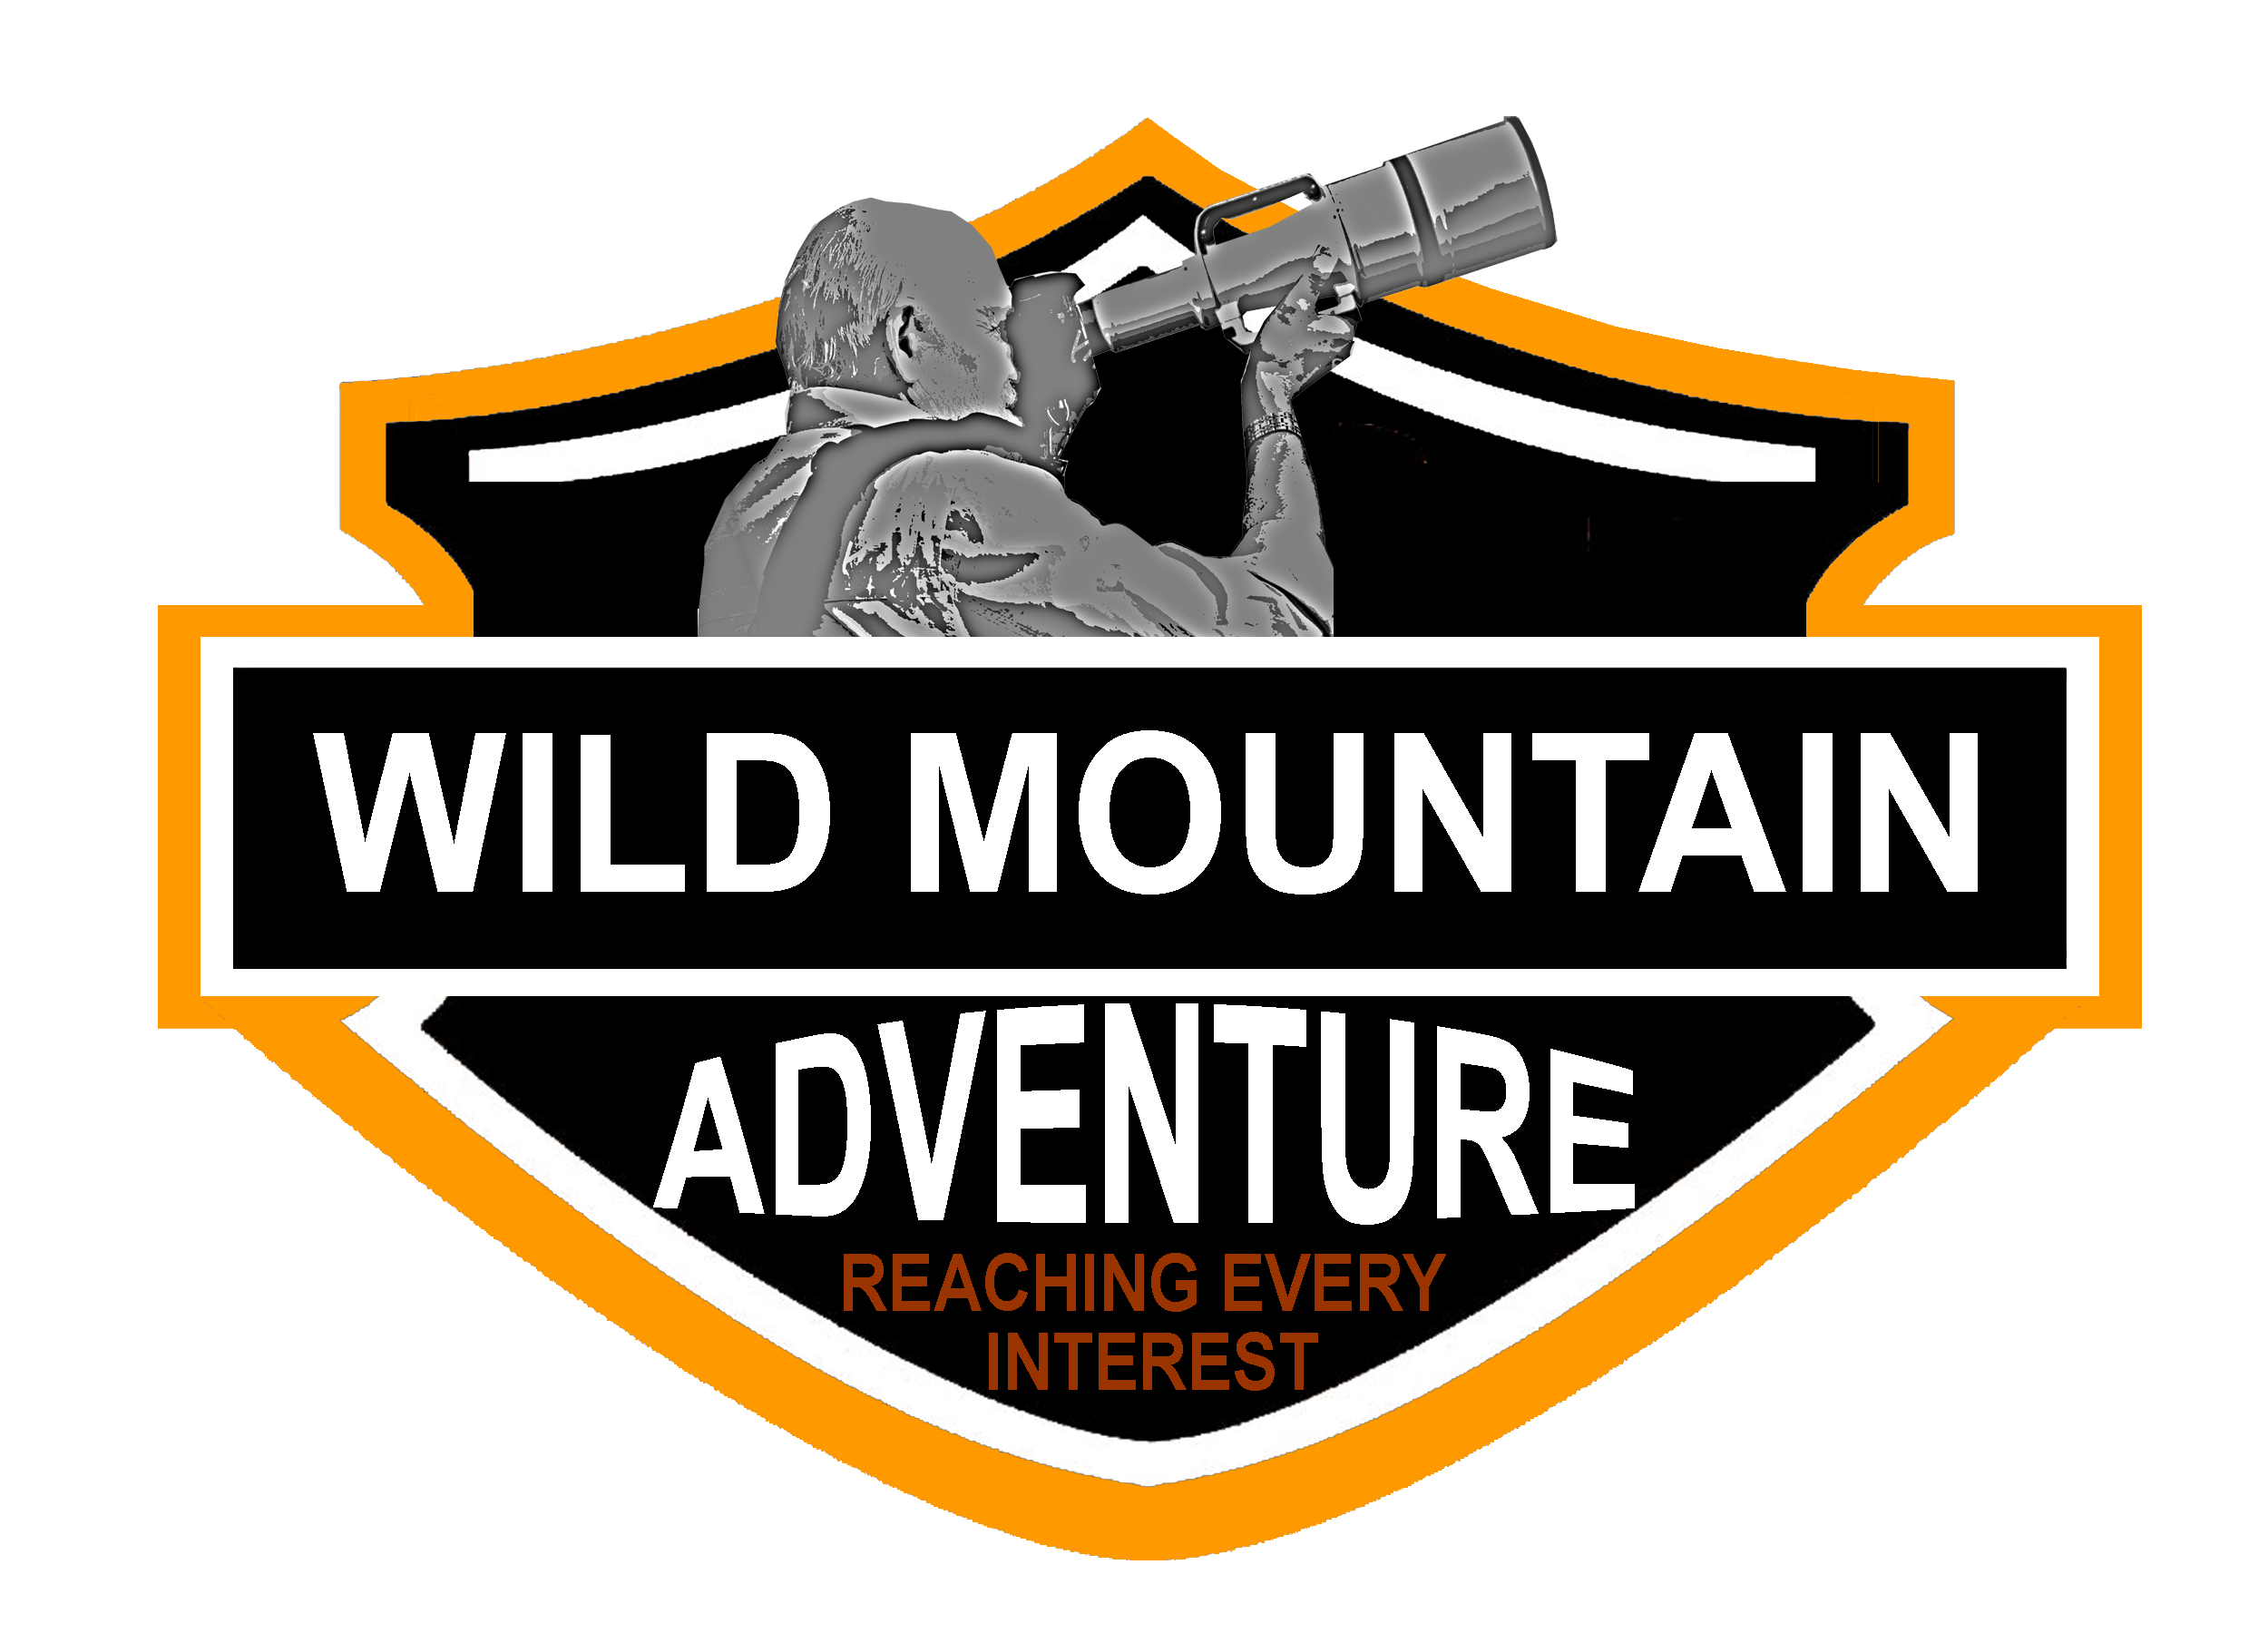 Wild mountain logopng. Hike clipart adventure tourism